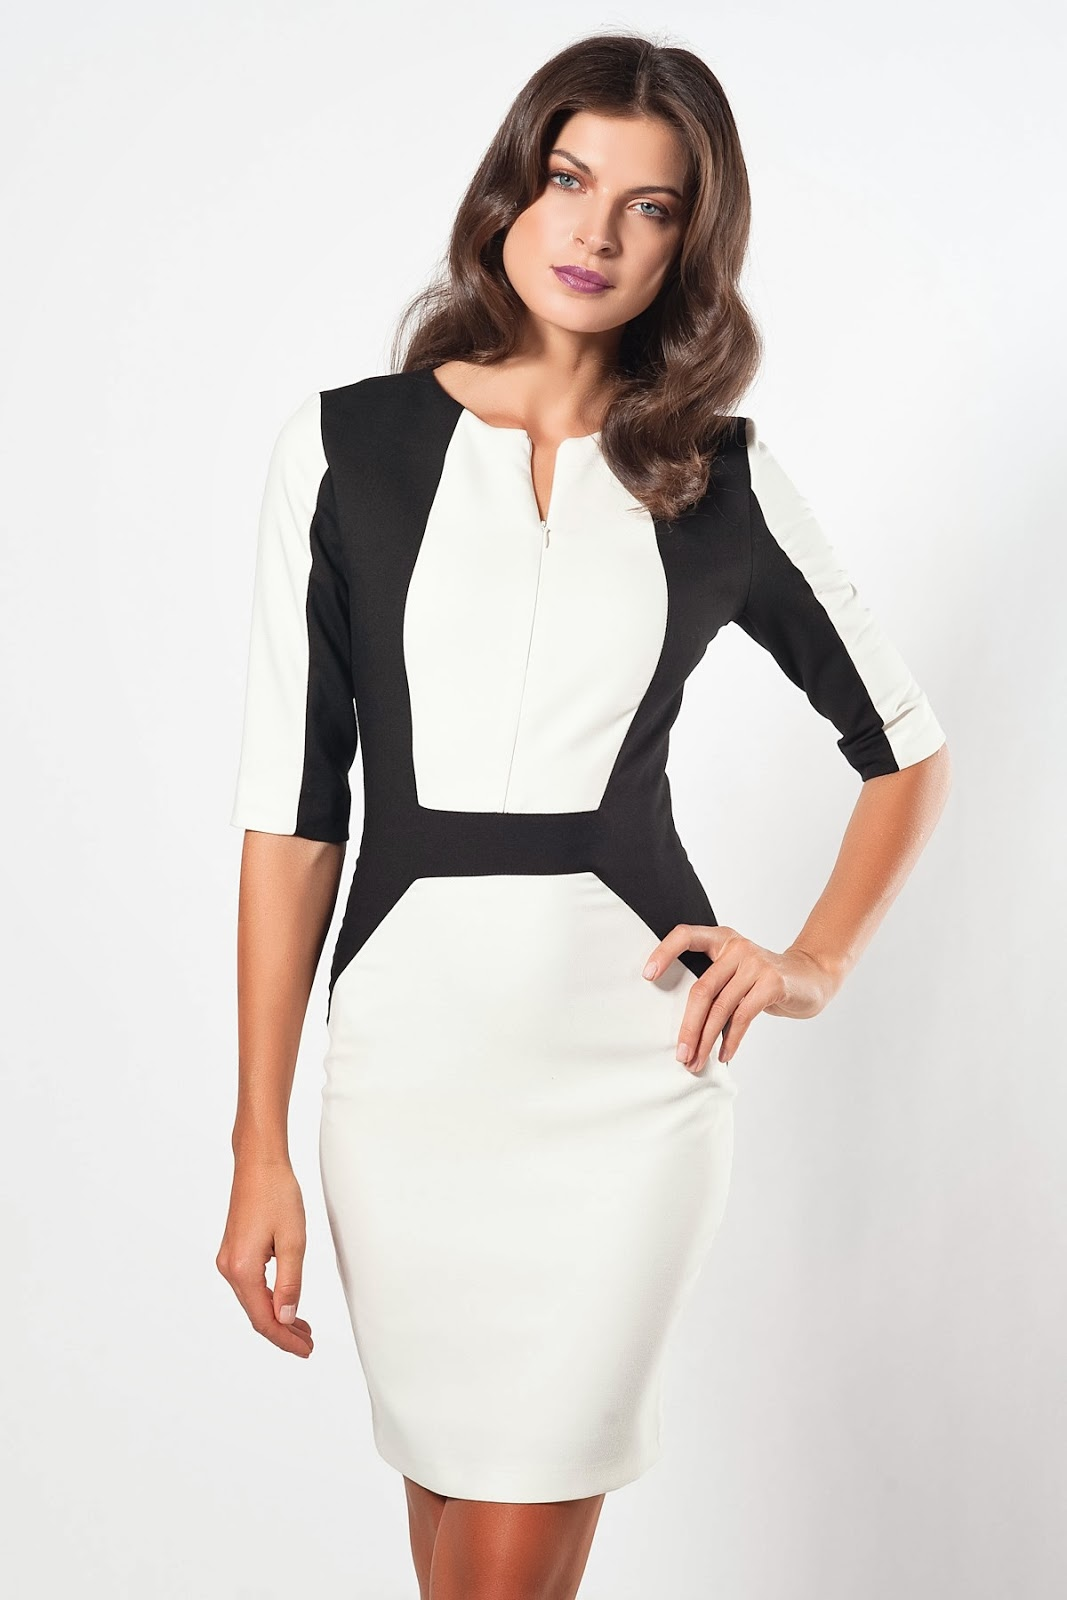 2014 Winter Latest New Fashion High Quality Mermaid Long ... |Fashion Night Dress 2014